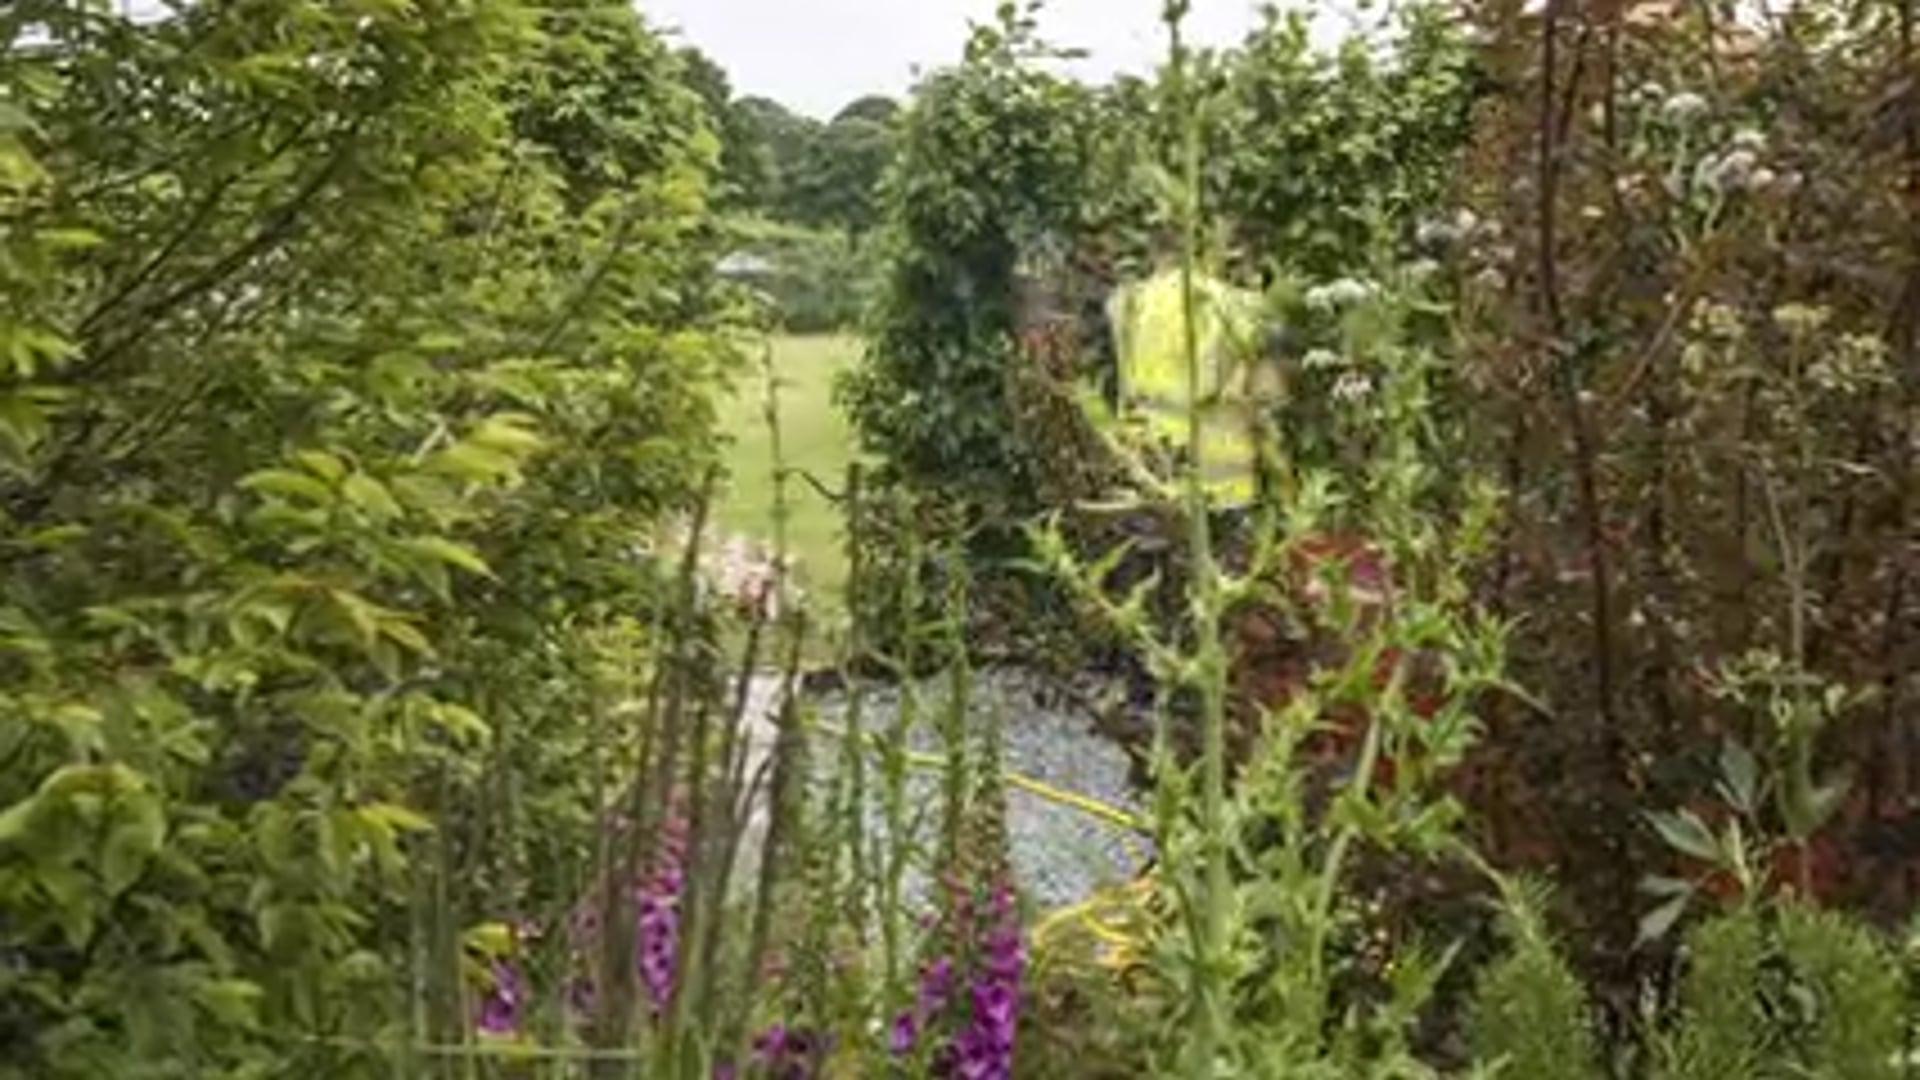 The Brewin Dolphin Artists Garden | RHS Chatsworth 2019